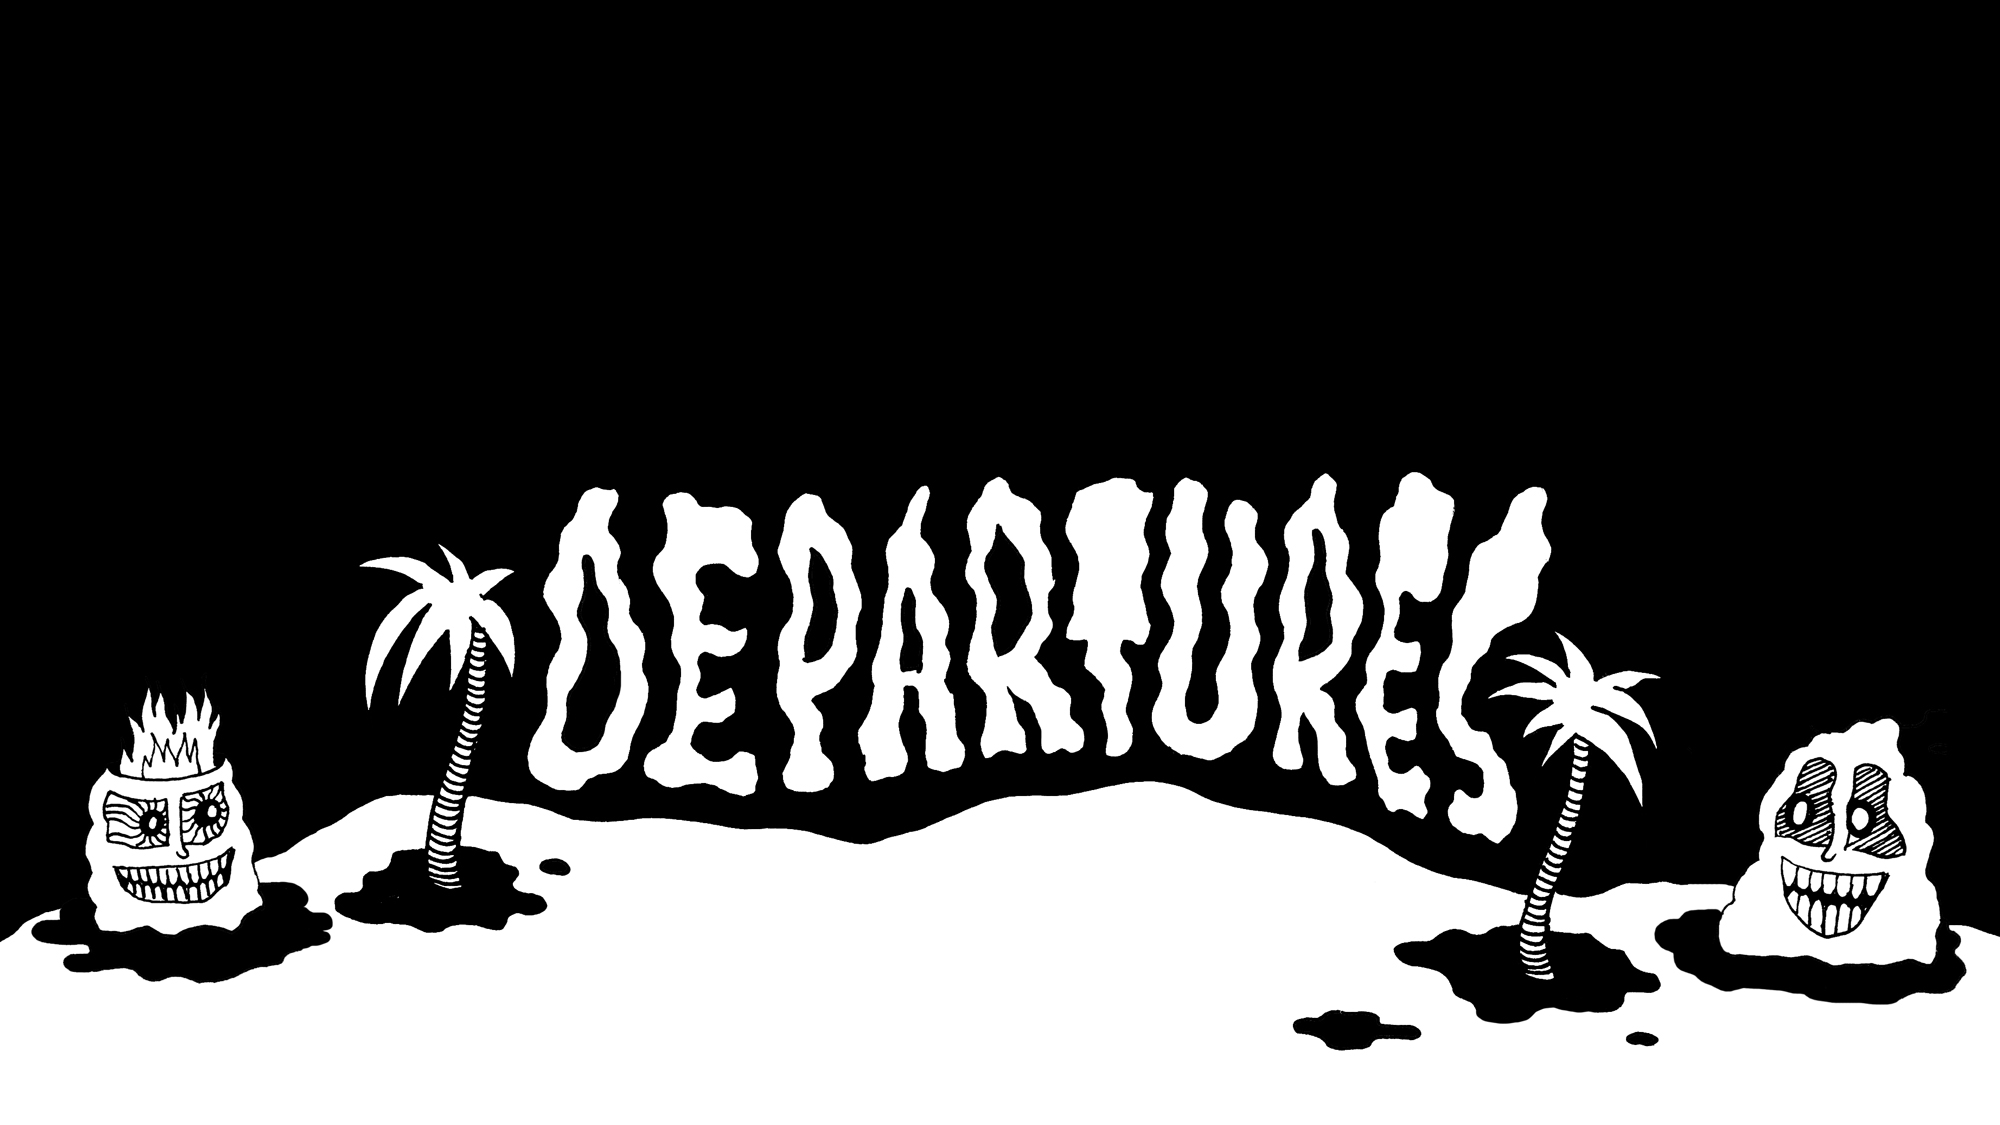 Departures - Marketing